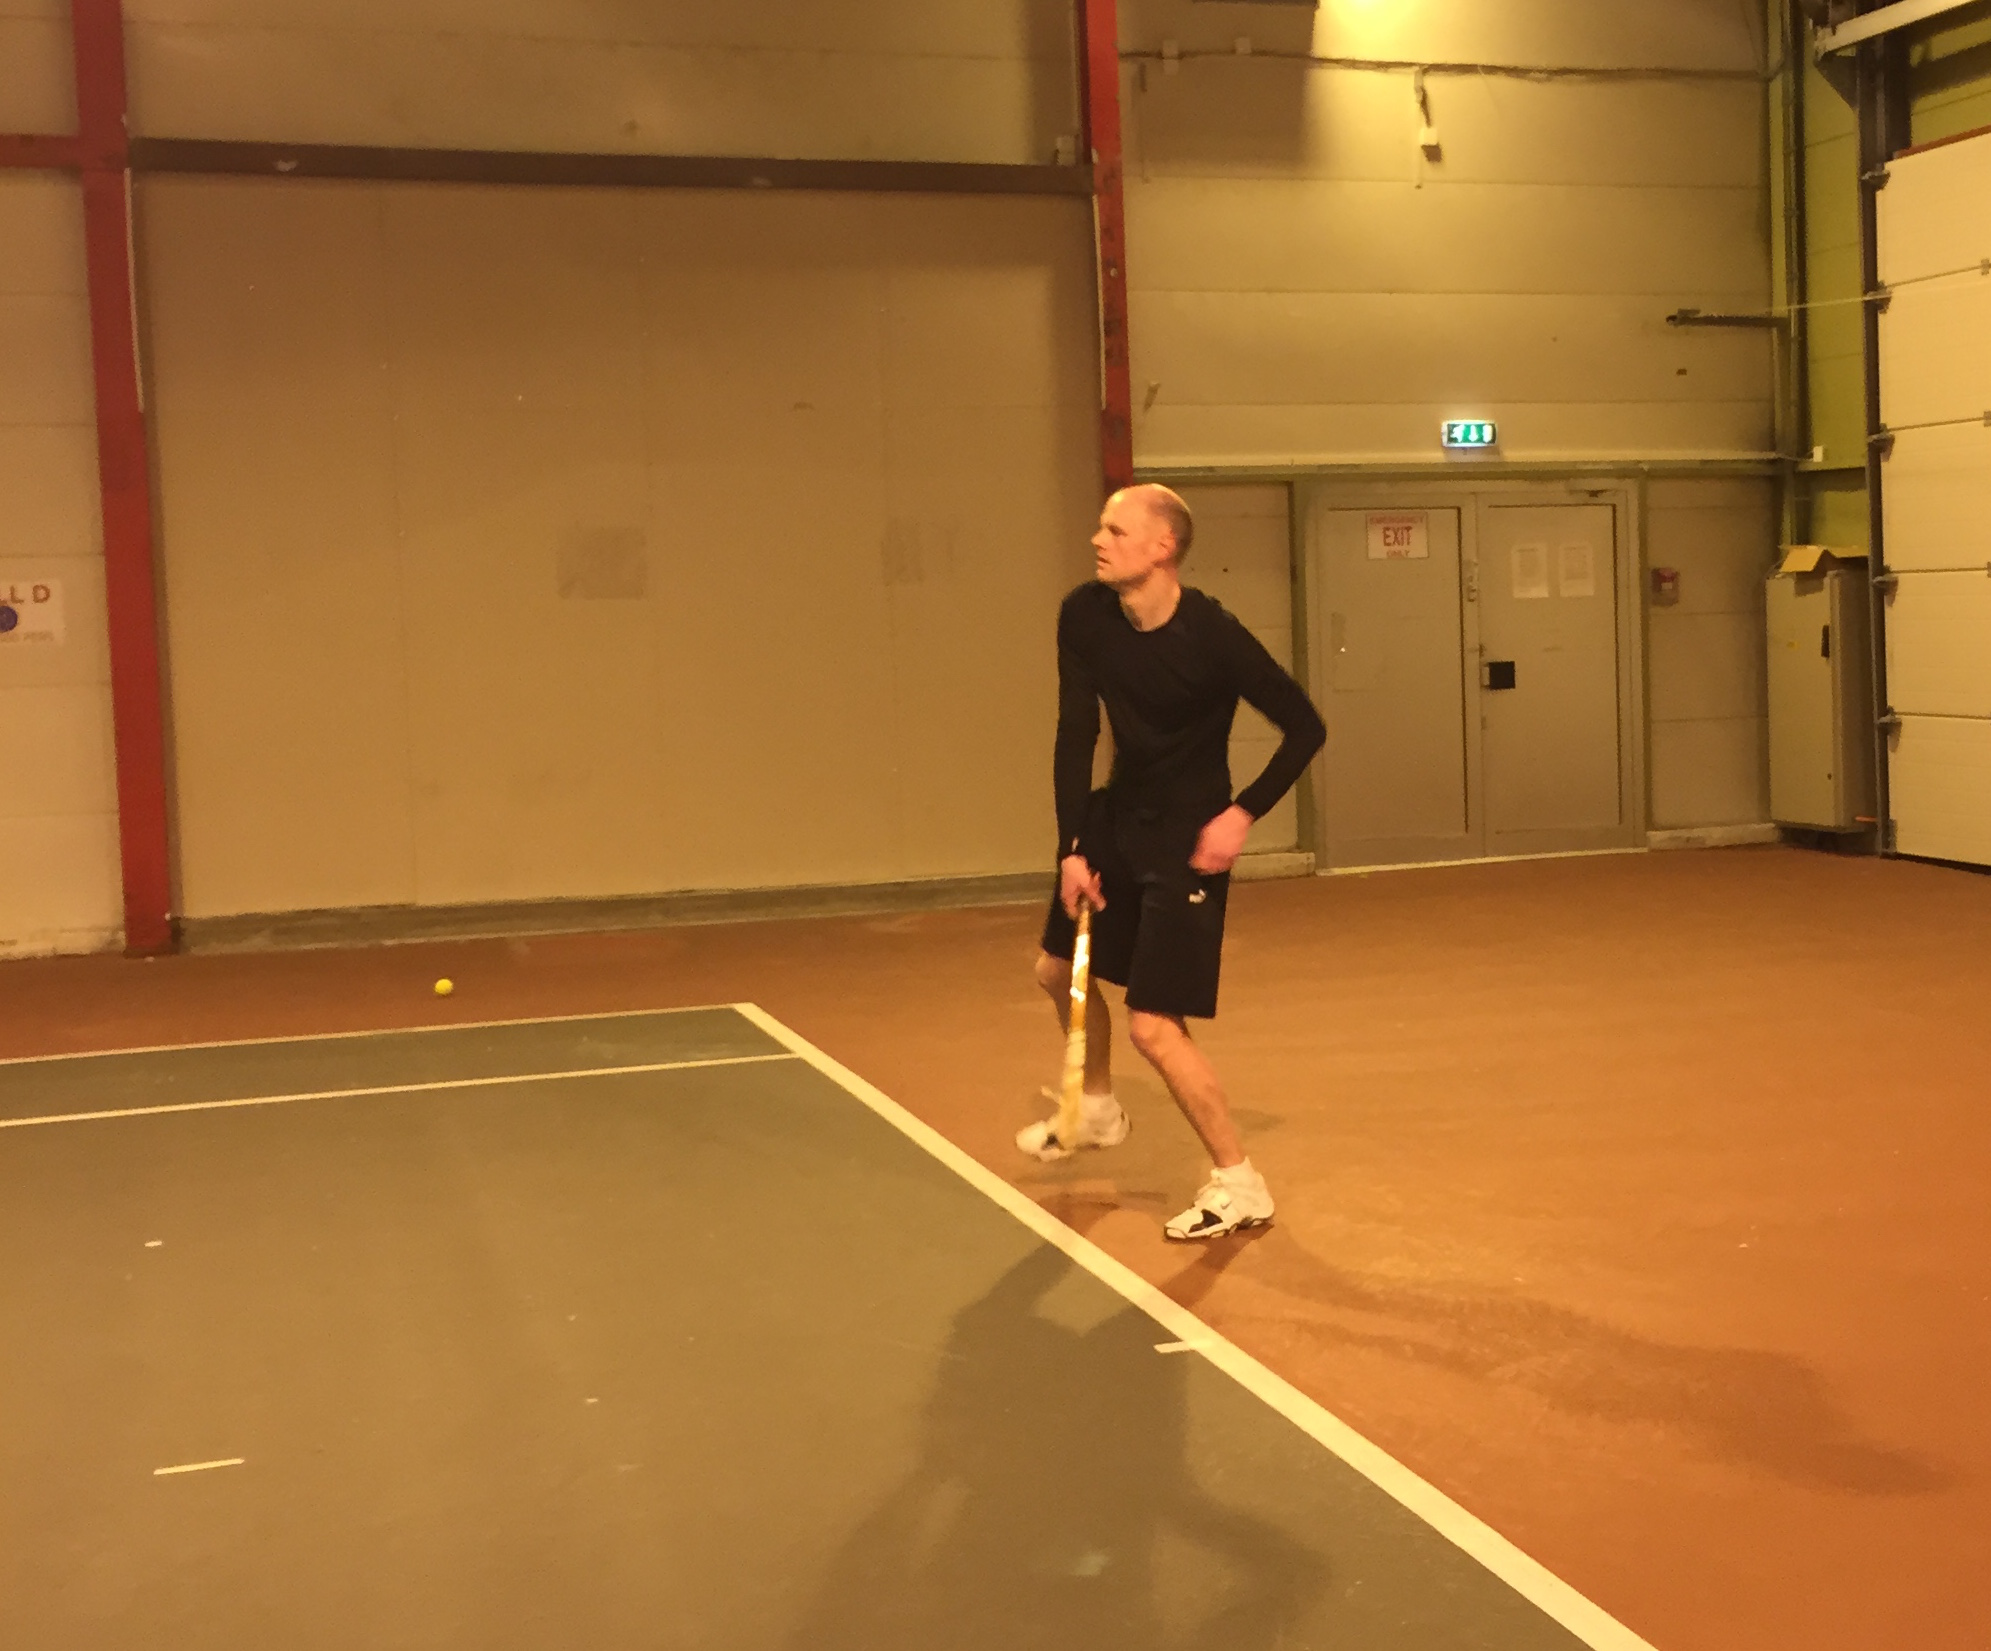 Om tennisbloggen.net